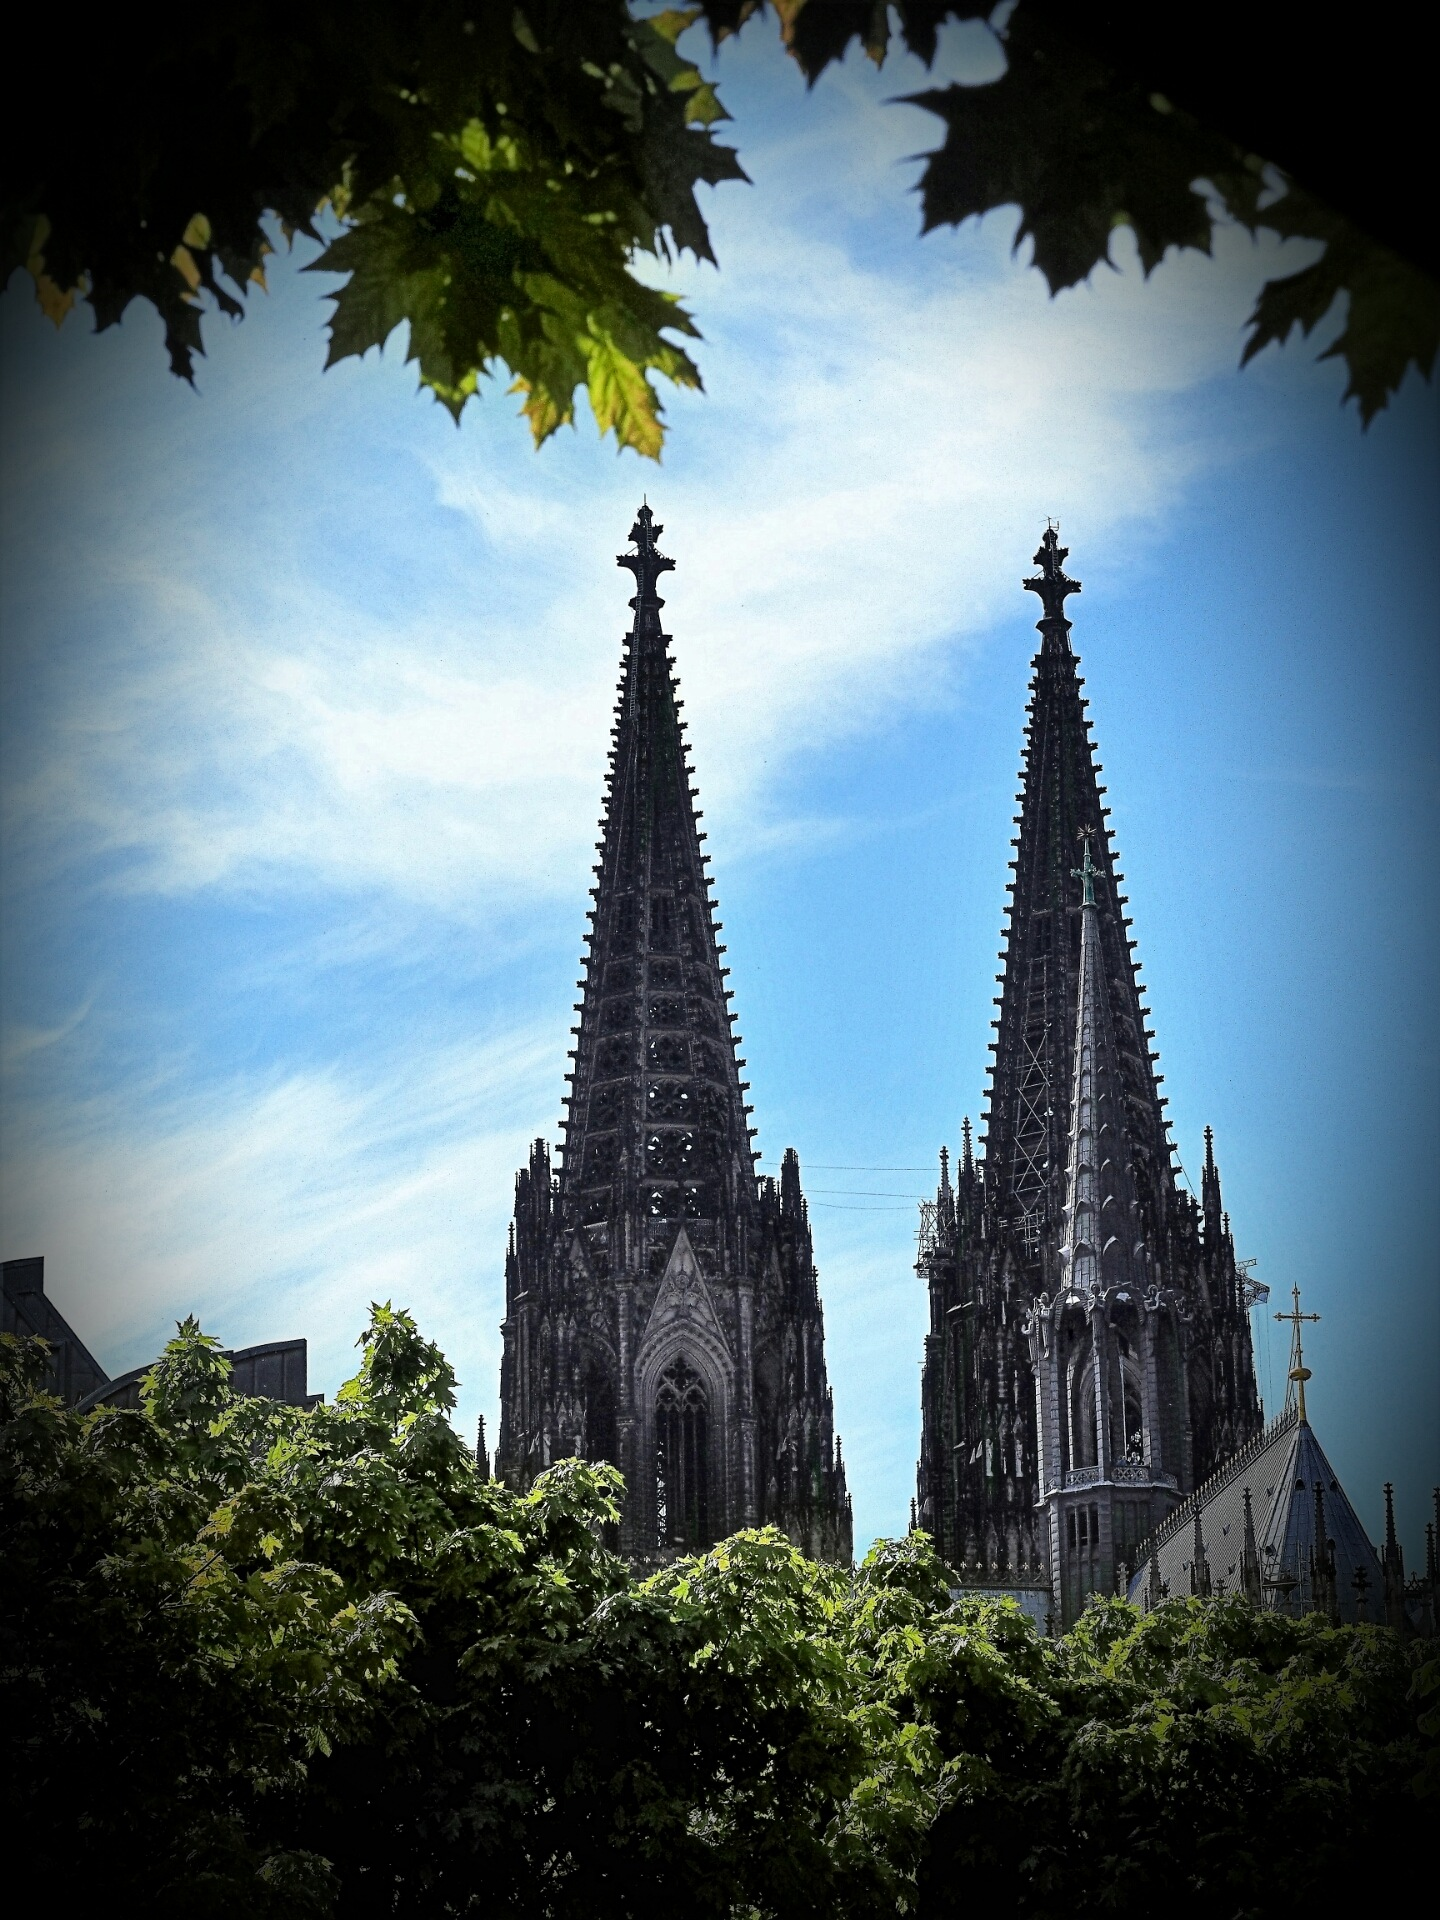 Cologne cathedral by Brigitte Bohlscheid